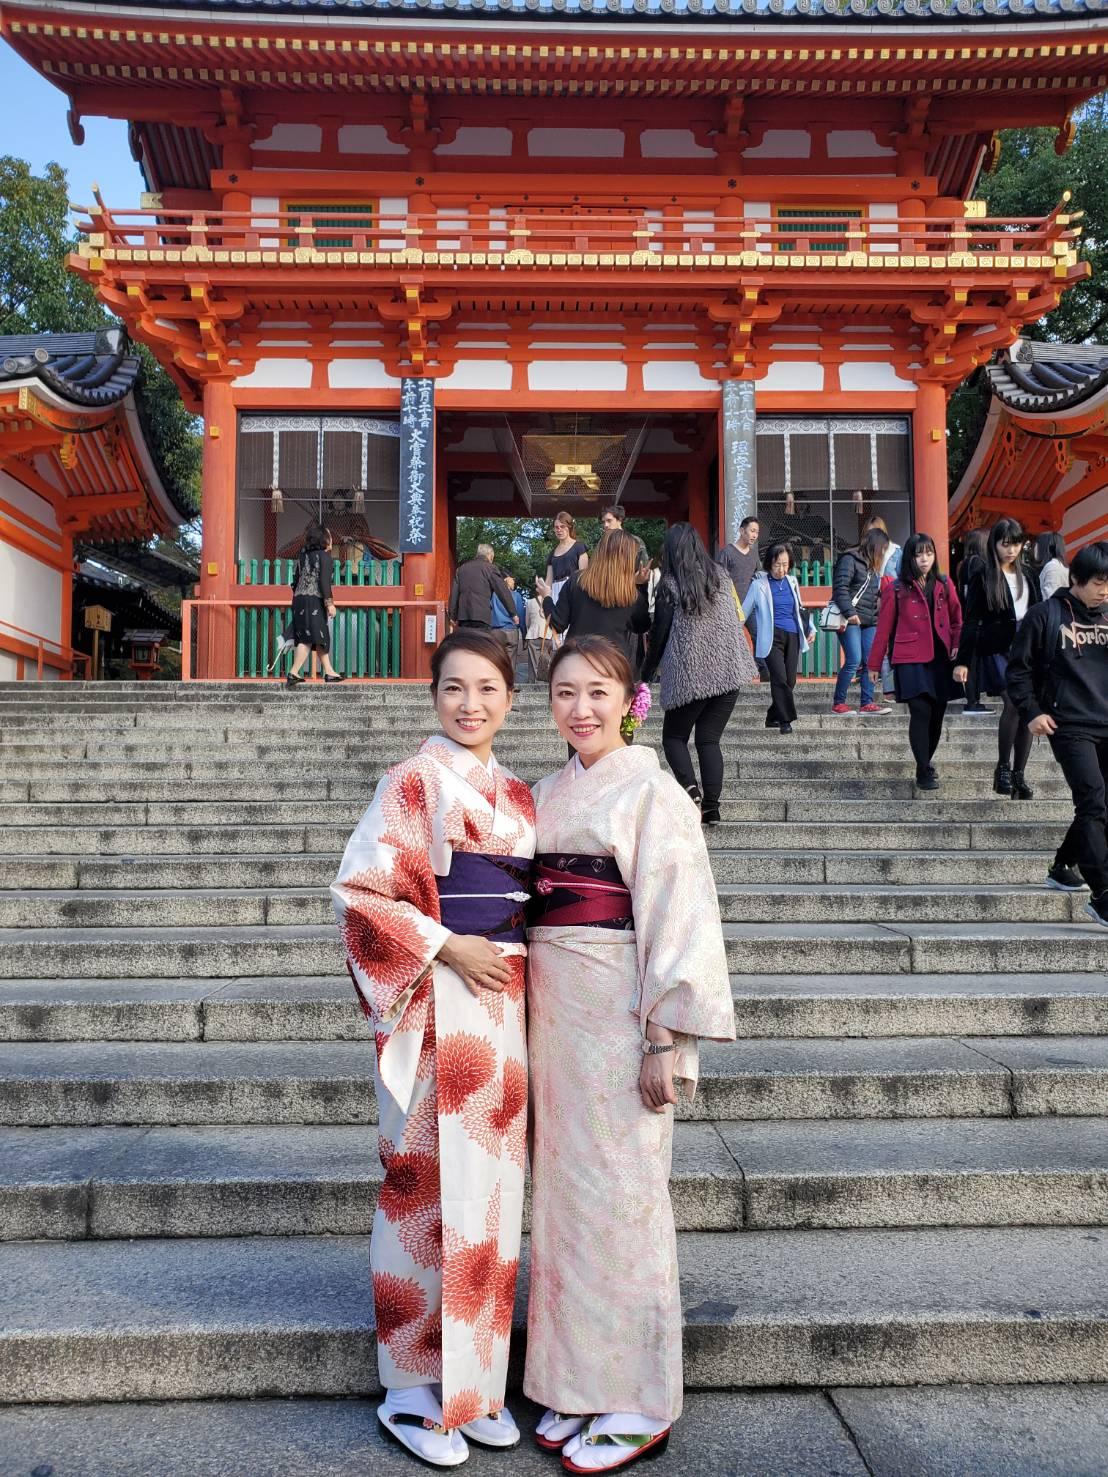 FLOWERS BY NAKED 2019 京都・二条城 大人気2019年11月17日13